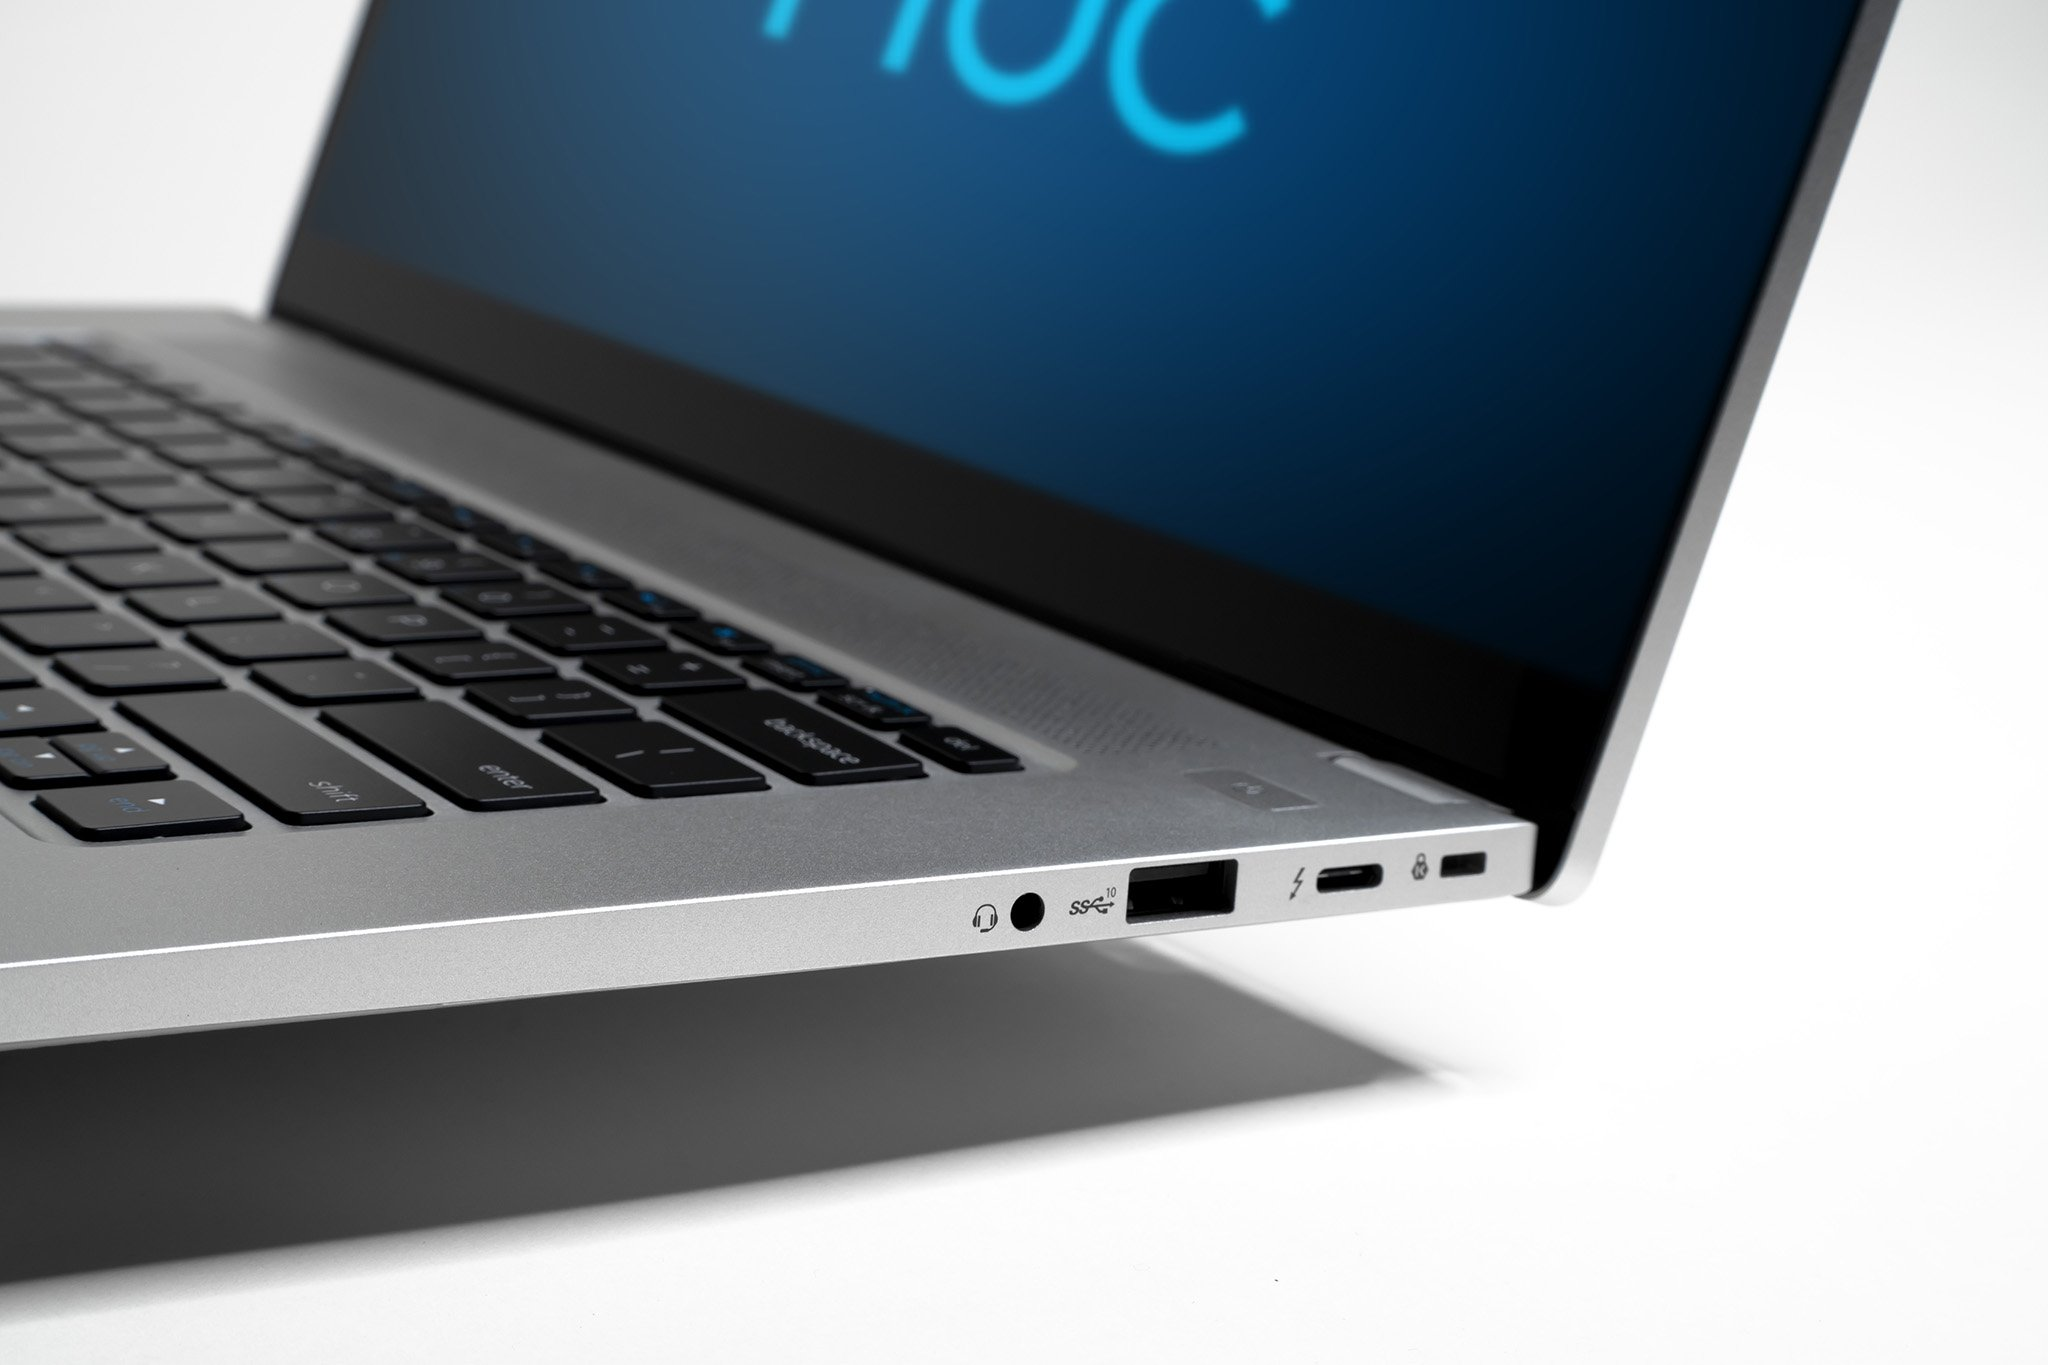 intel-nuc-m15-laptop-kit-1-jpg.11948